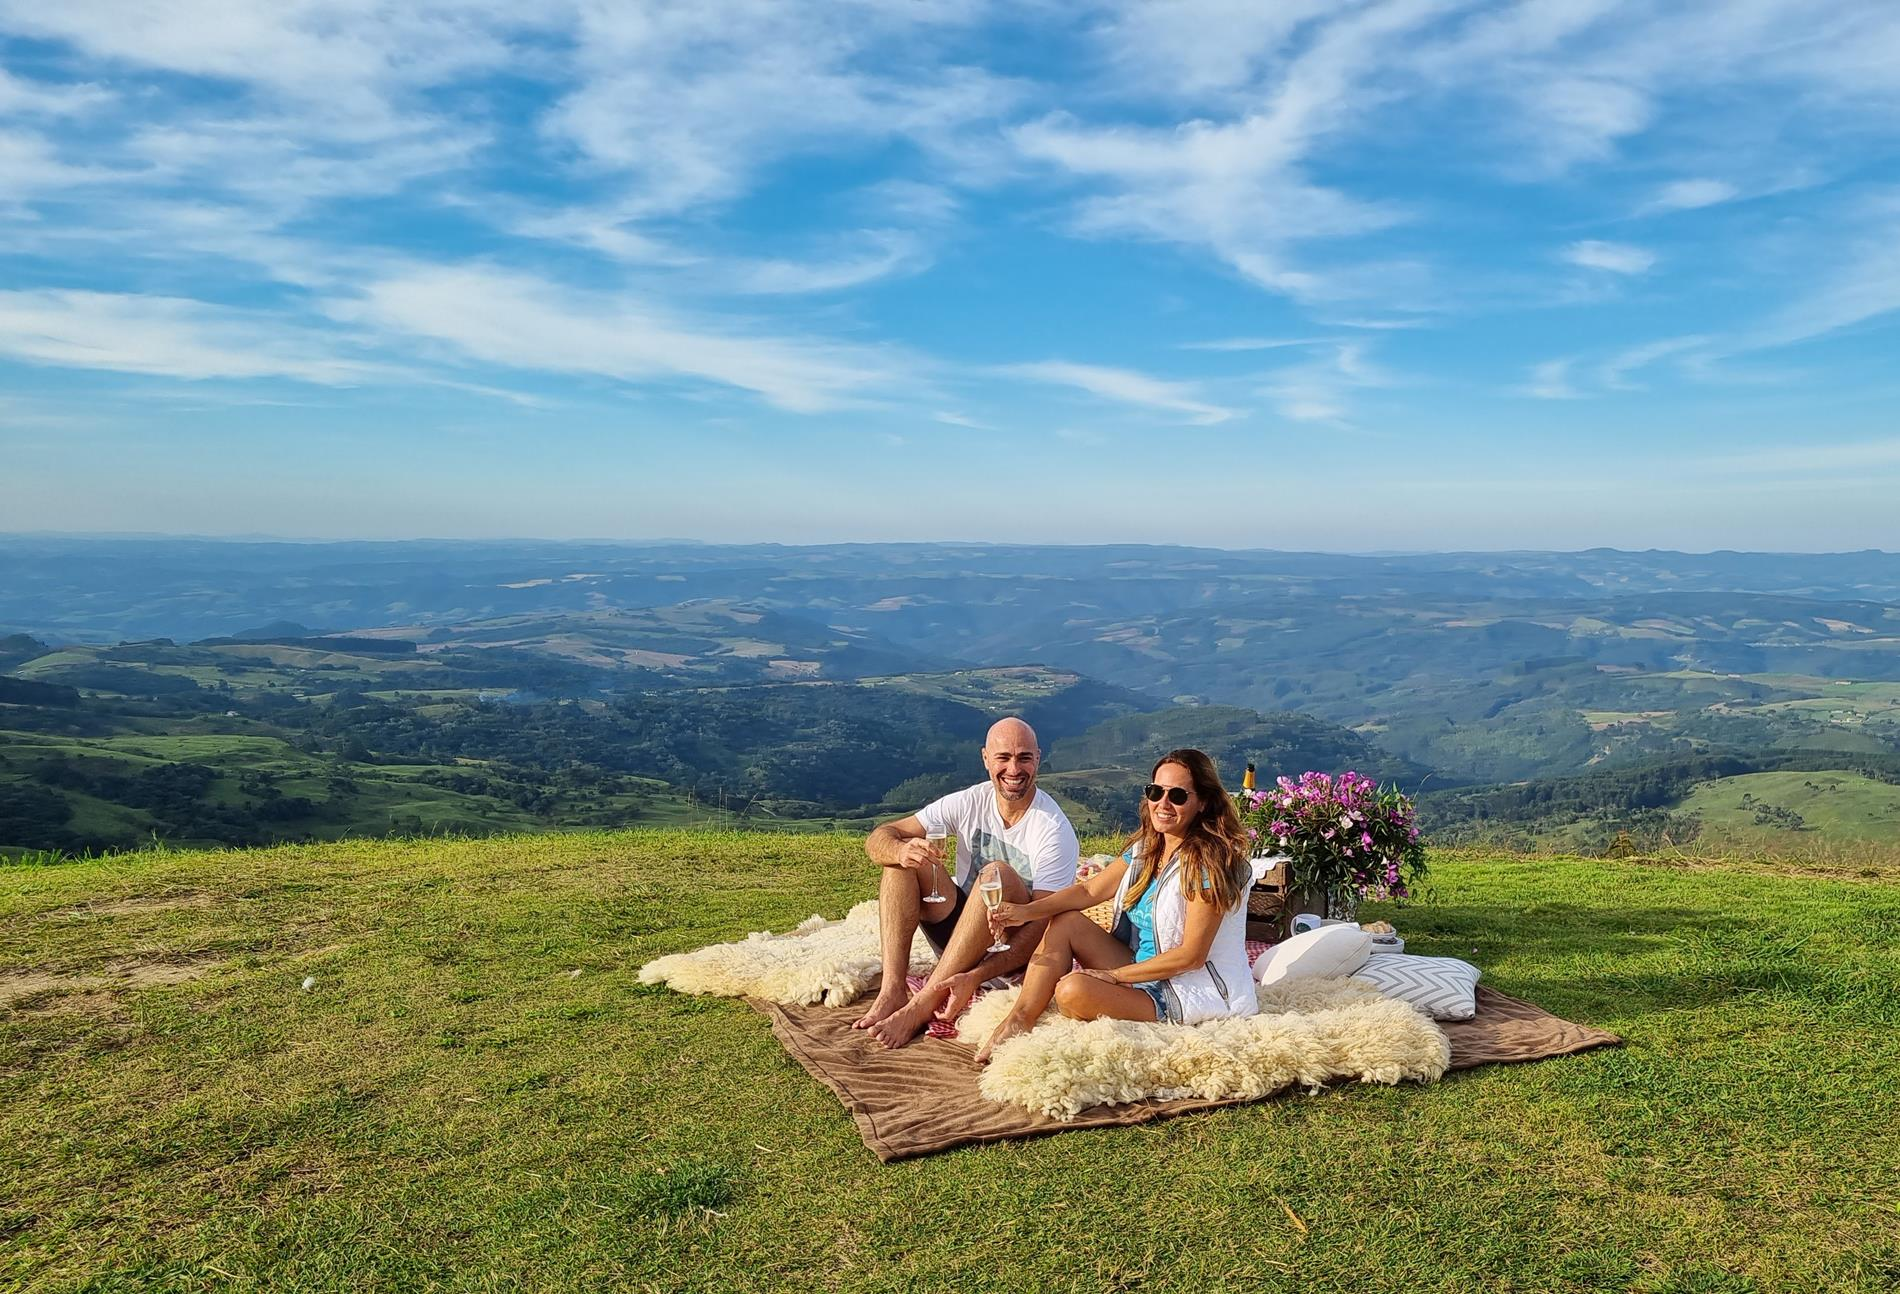 picnic na montanha